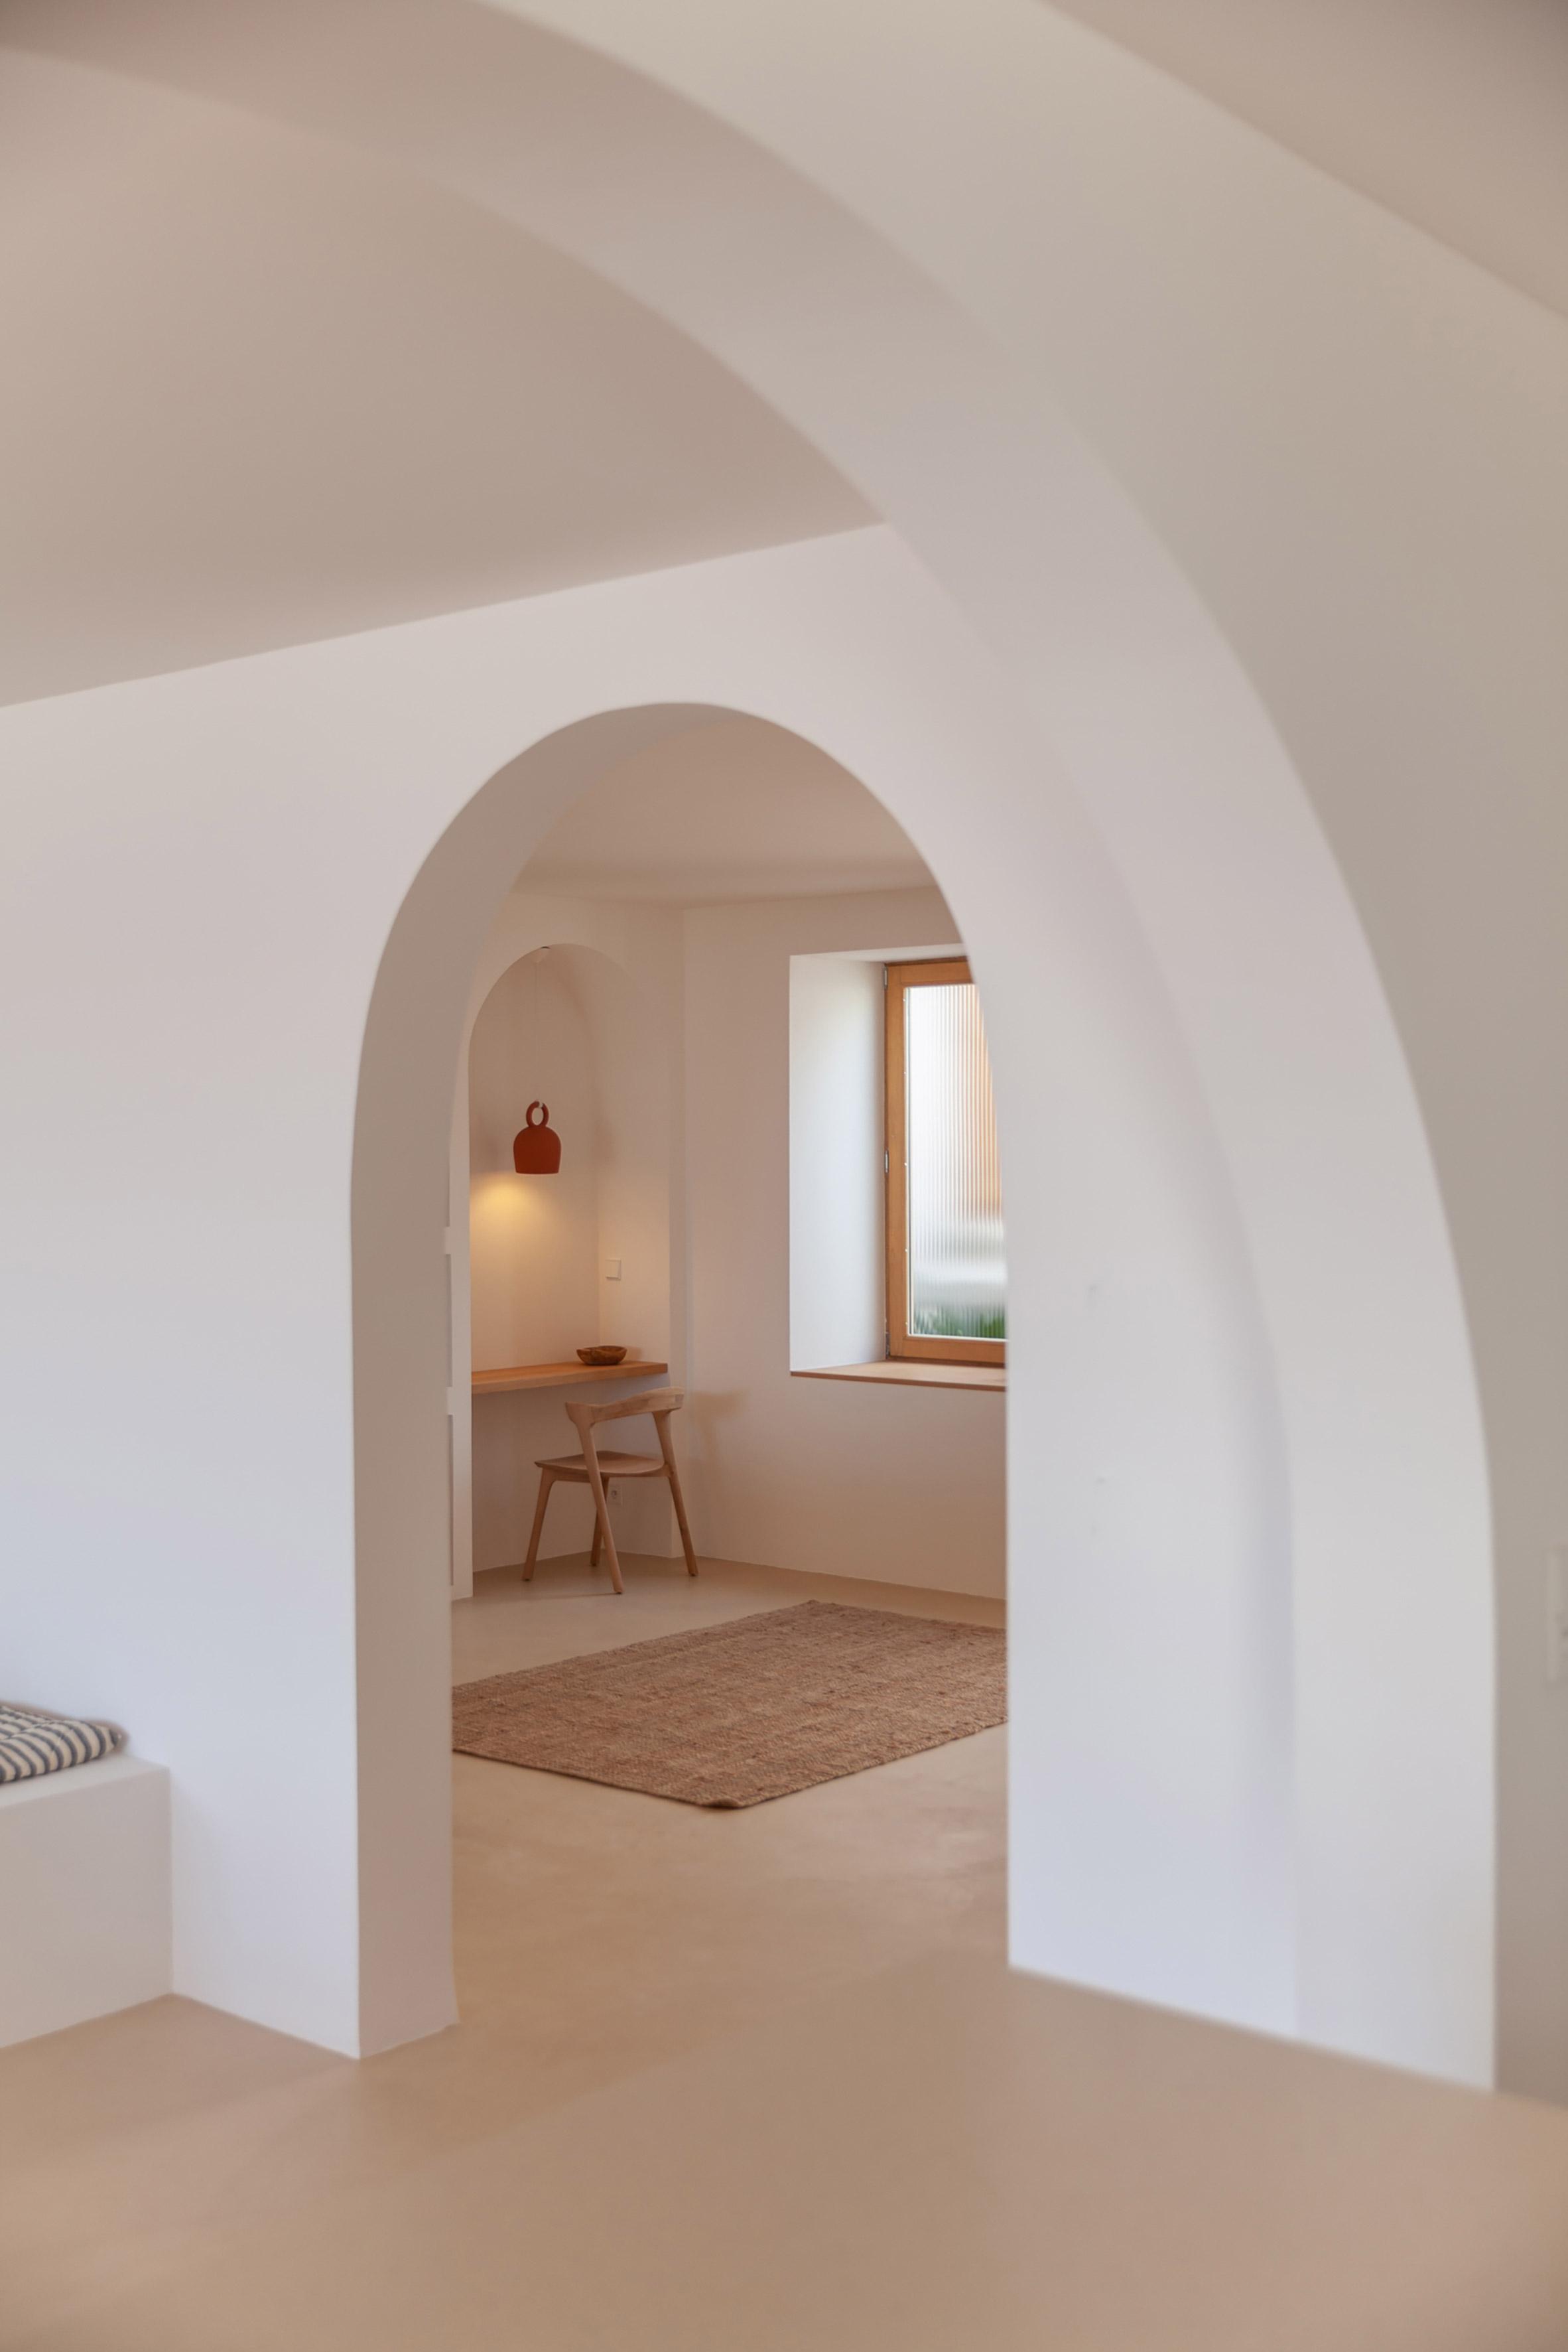 Casa Santa Teresa by Amelia Tavella